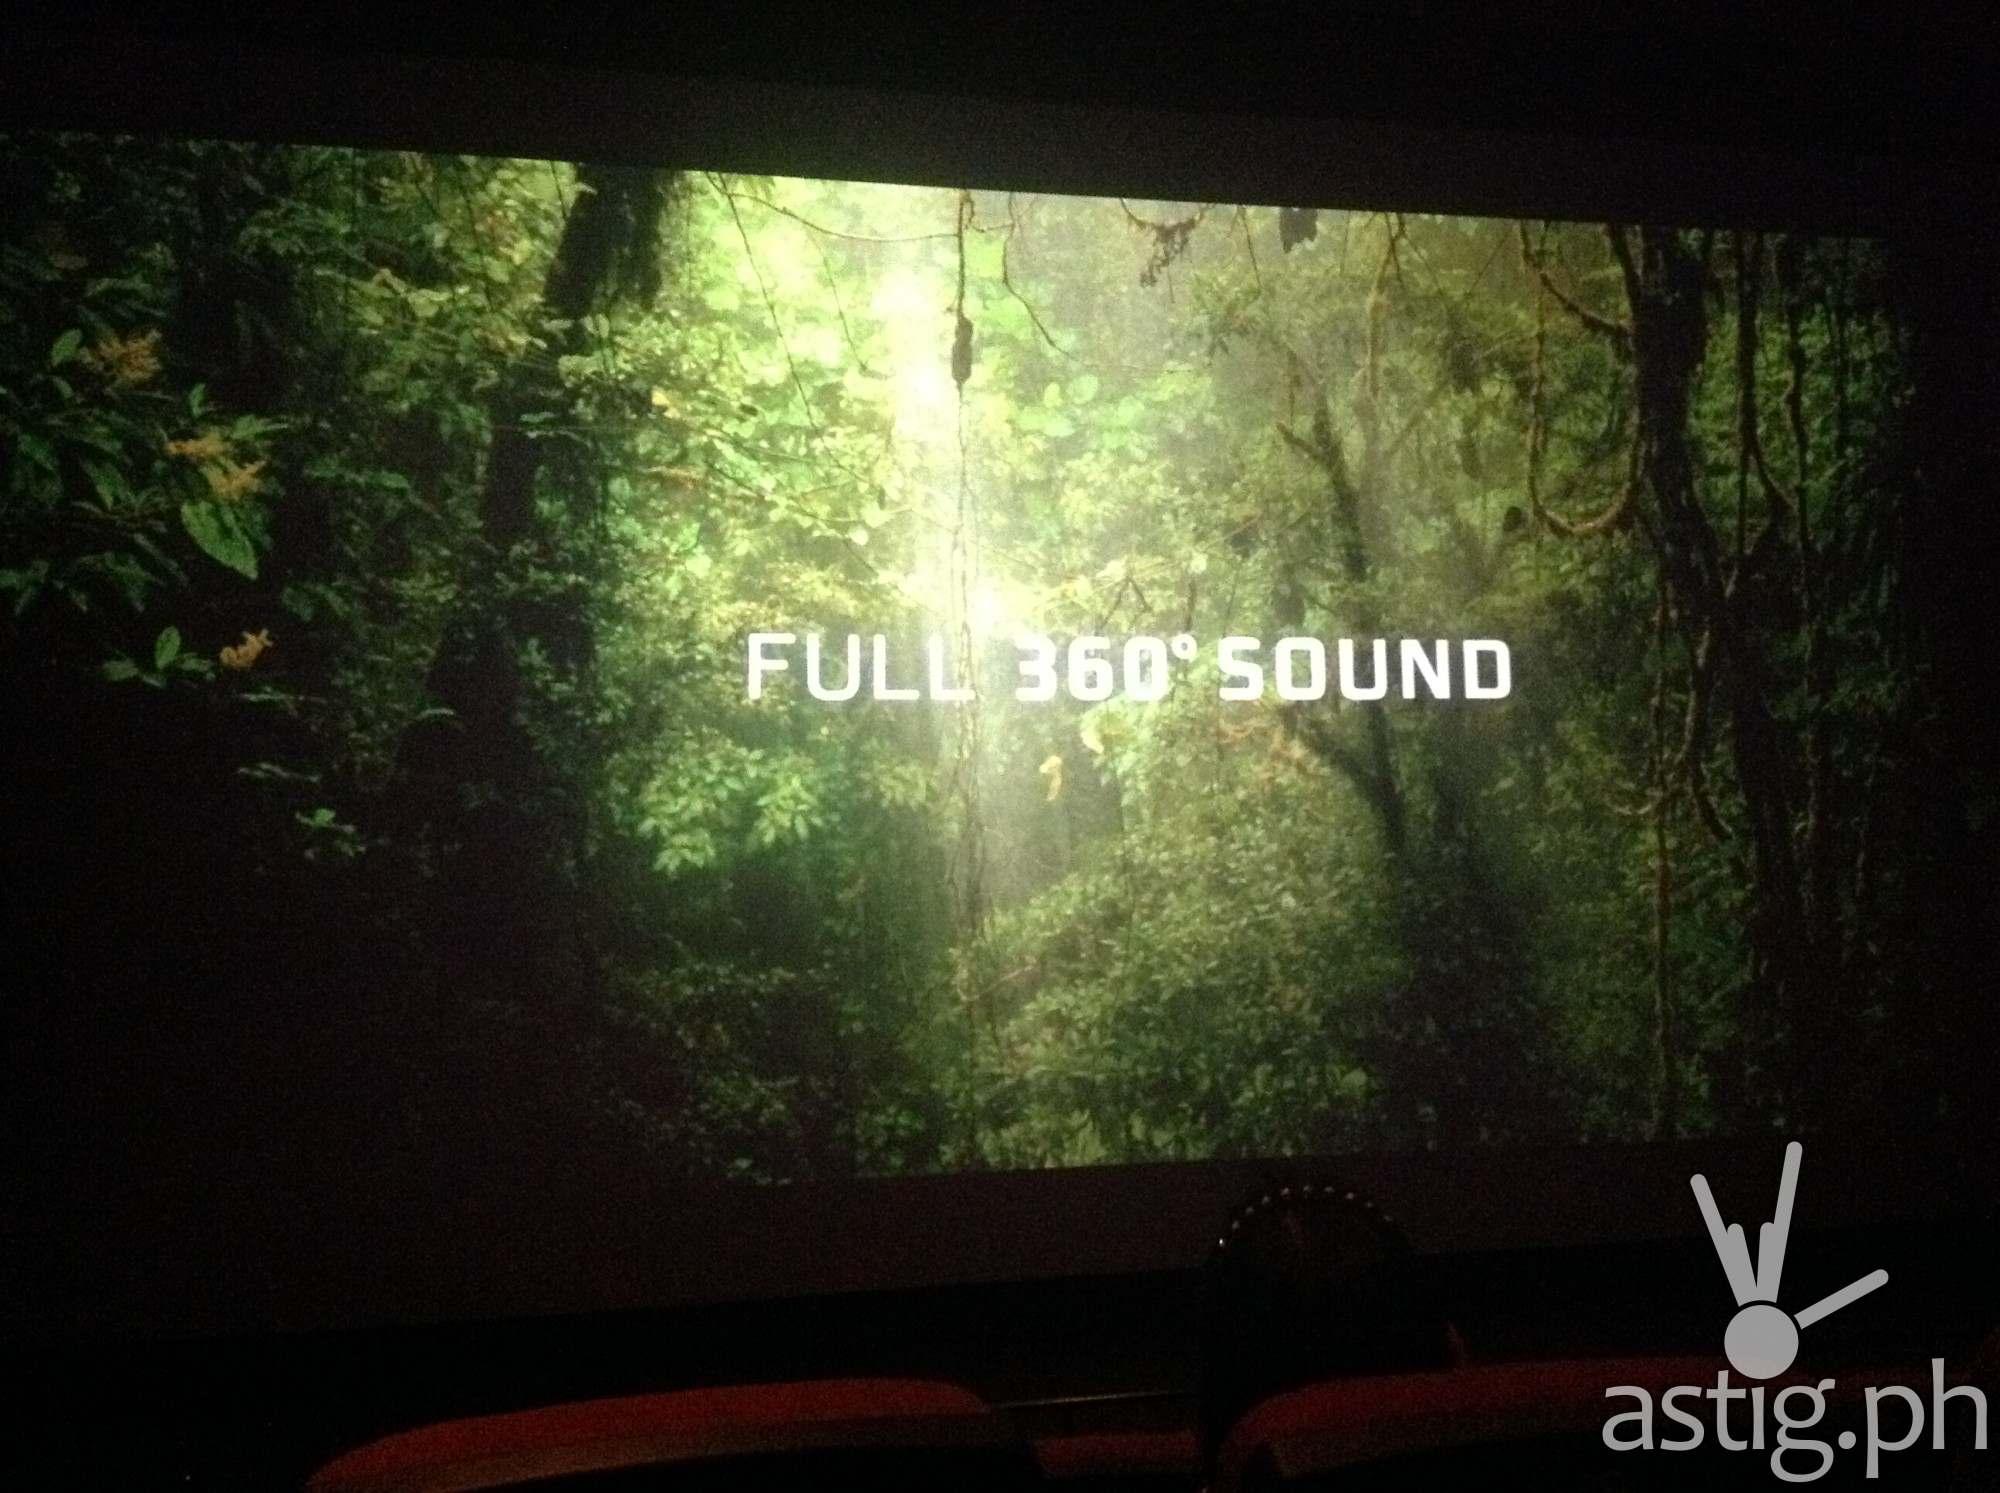 Full 360° Sound